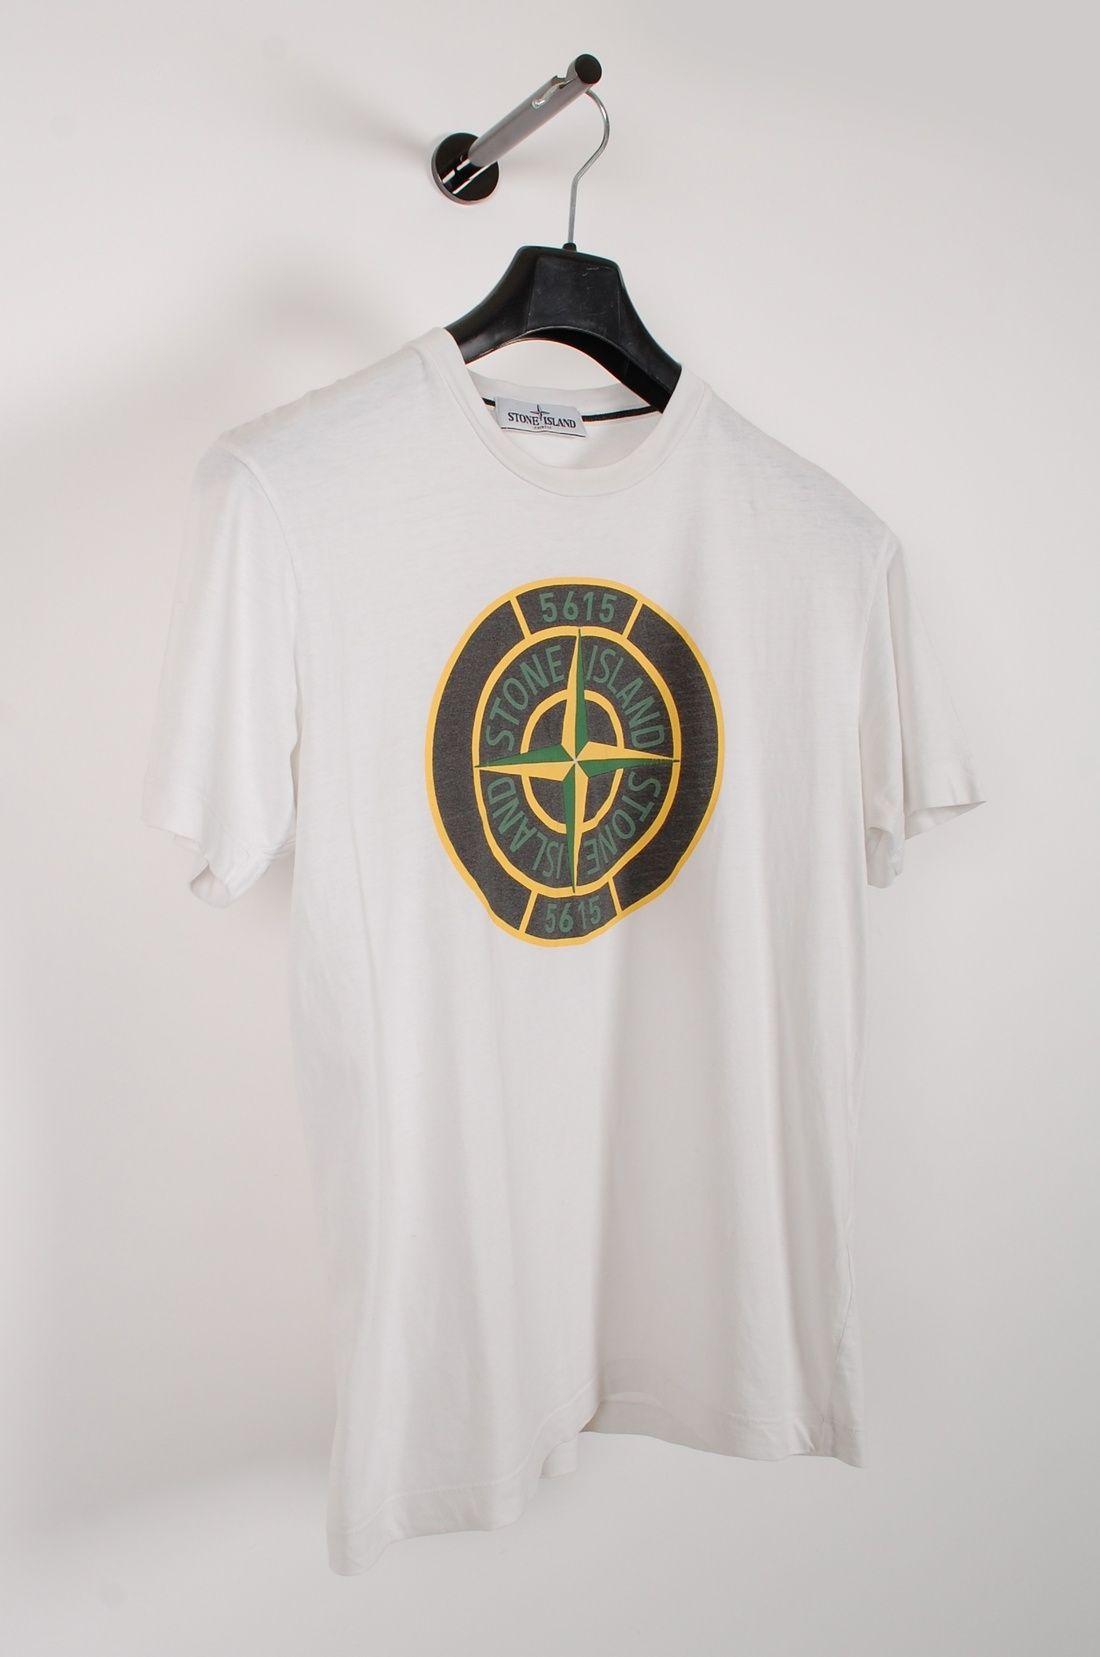 Stone Island Original Stone Island White Men T Shirt In Size M Size M 89 Mens Tshirts T Shirt Stone Island